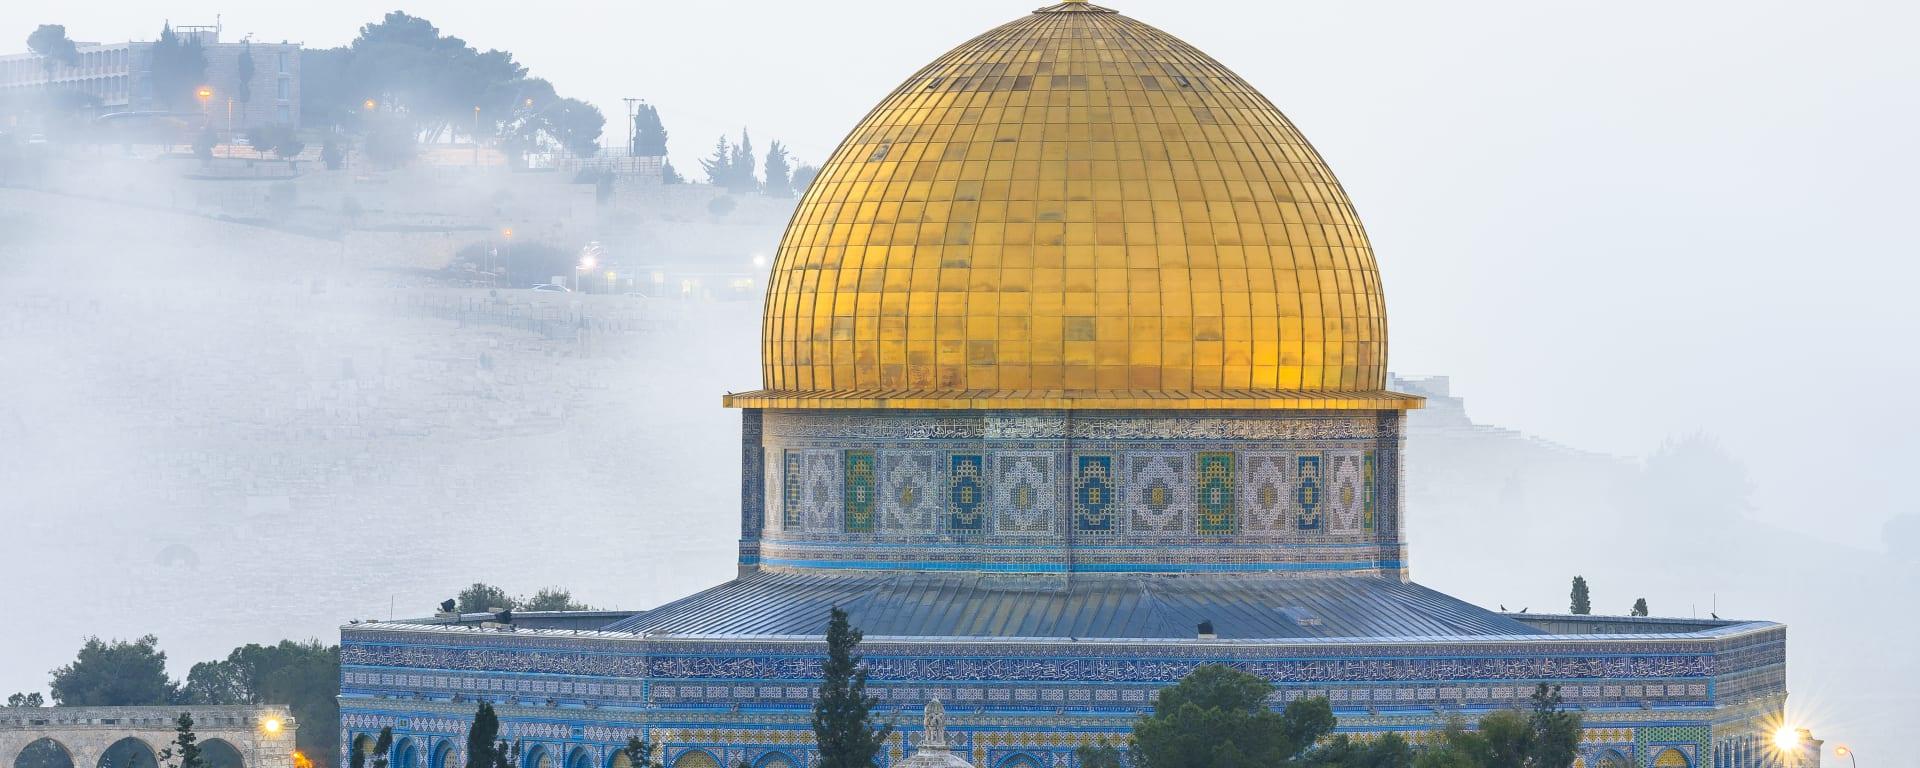 Israel entdecken mit Tischler Reisen: Israel Jerusalem Felsendom